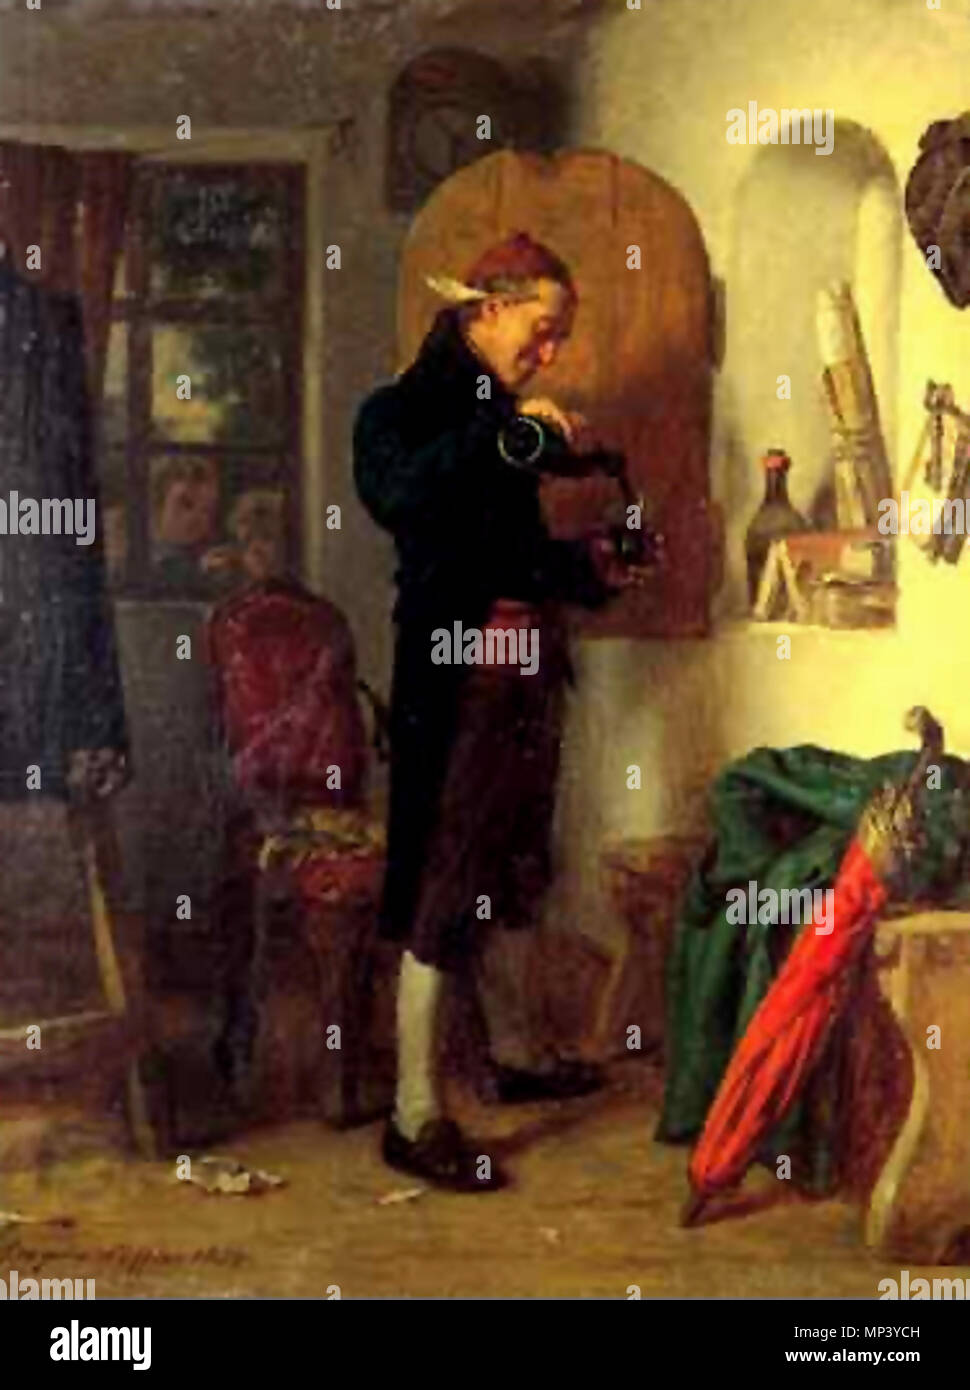 Deutsch: Leopold Löffler. English: Artist in his studio (feather-pen behind his ear) pouring himself A glass of wine for refreshment by Leopold Loeffler, oil on canvas, 33.5 x 25.5 cm Polski: Artysta w swoim studio. Kieliszek wina obraz Leopolda Loefflera (Löfflera), olej, 33.5 x 25.5 cm   circa 1870.   805 Leopold Loeffer - Artist at work 1 - Stock Image